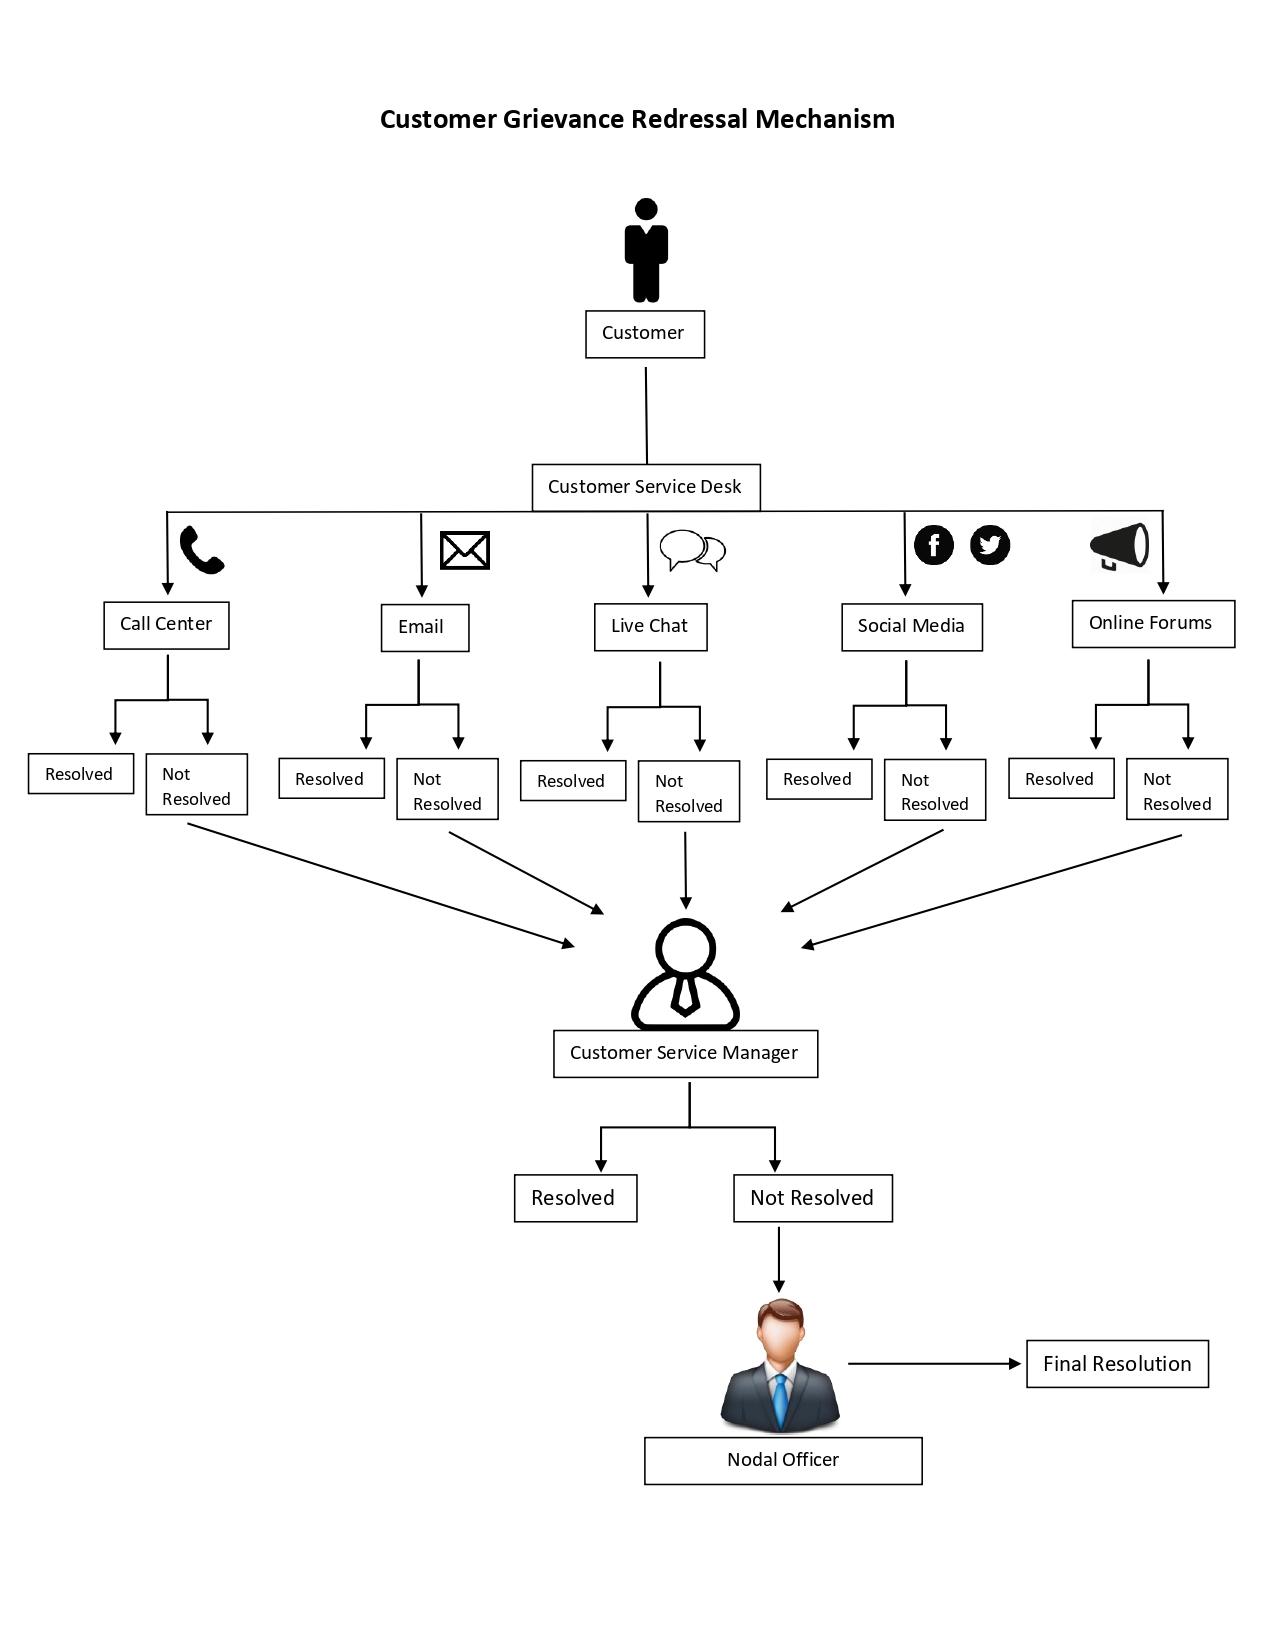 Customer Complaint Resolution Snapshot